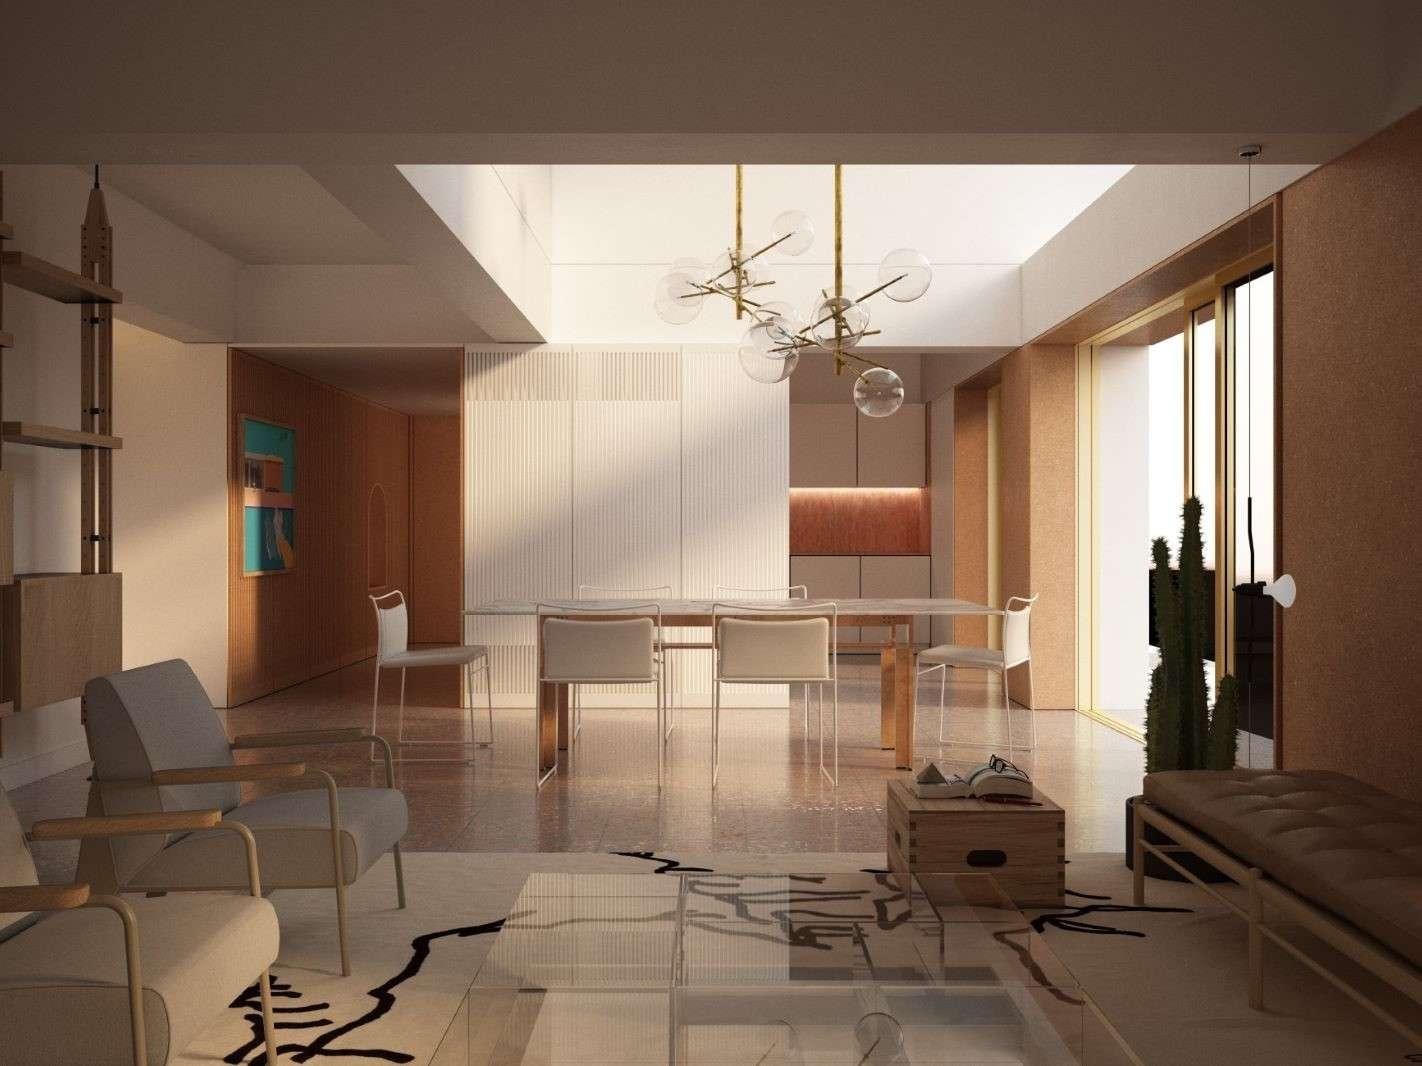 images-prod-prop-004604-sala_apartamento_i_1623936717333-jpg